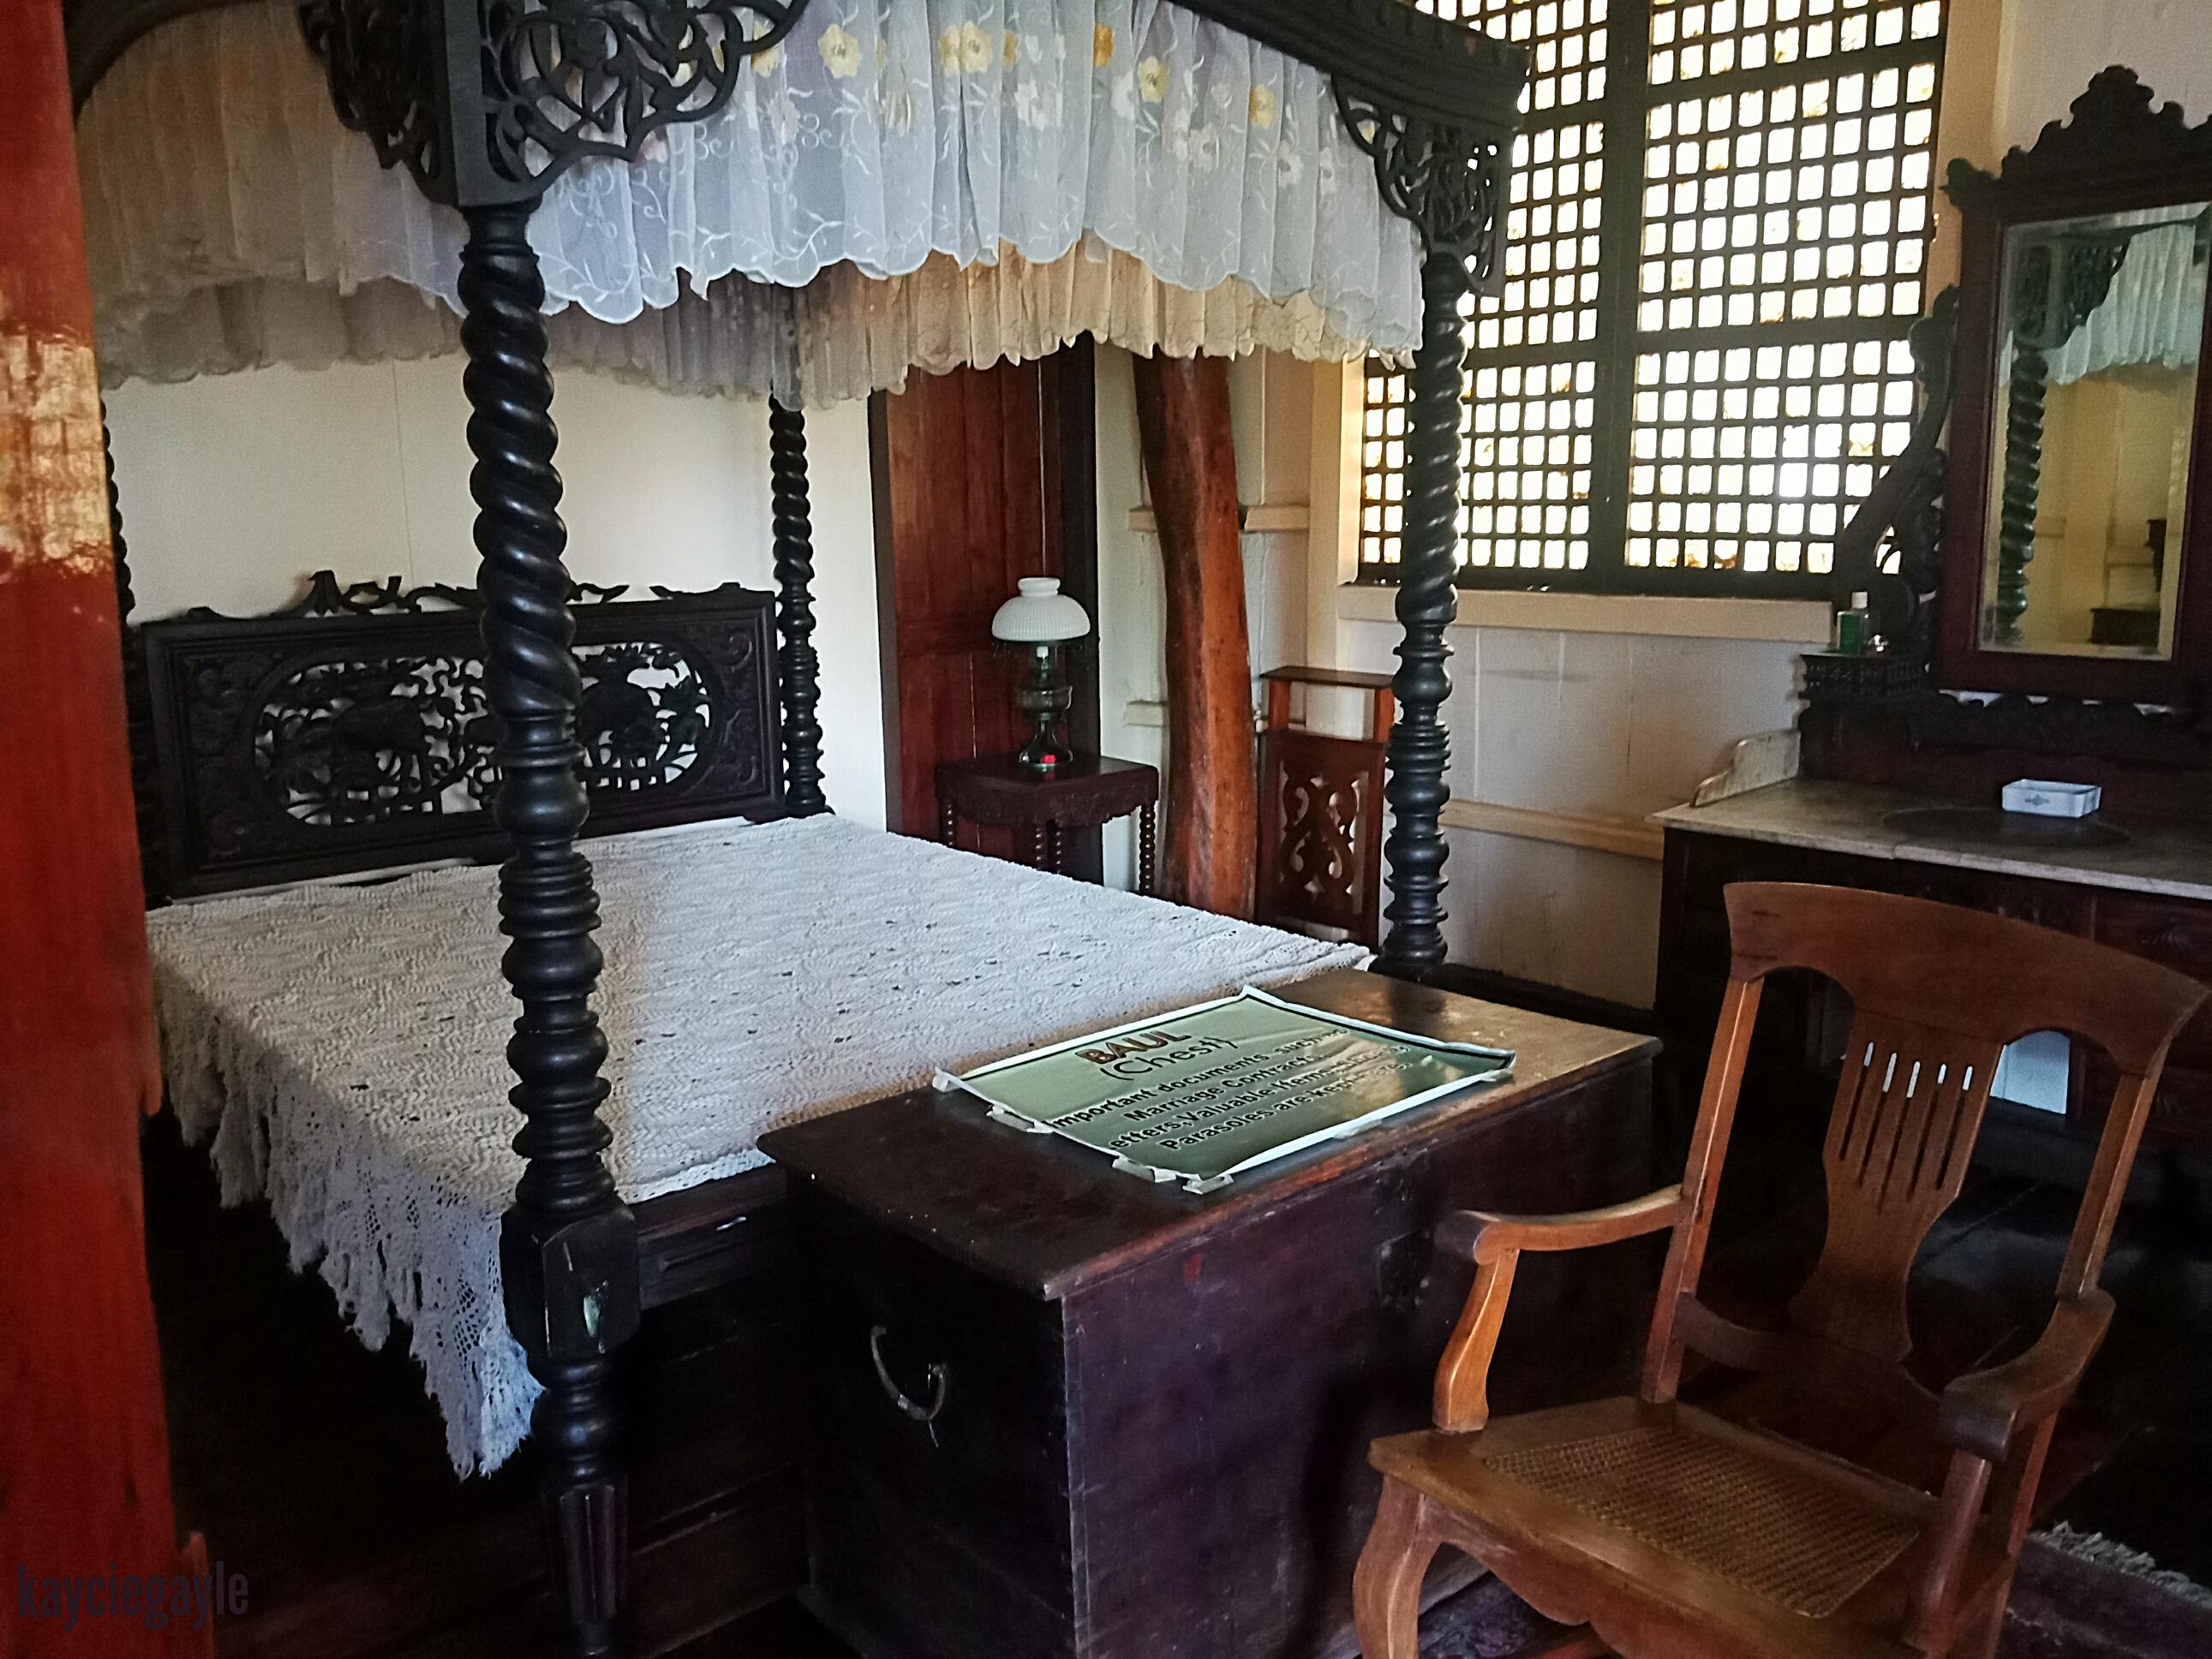 Crisologo Museum Vigan Ilocos Sur Philippines Bedroom